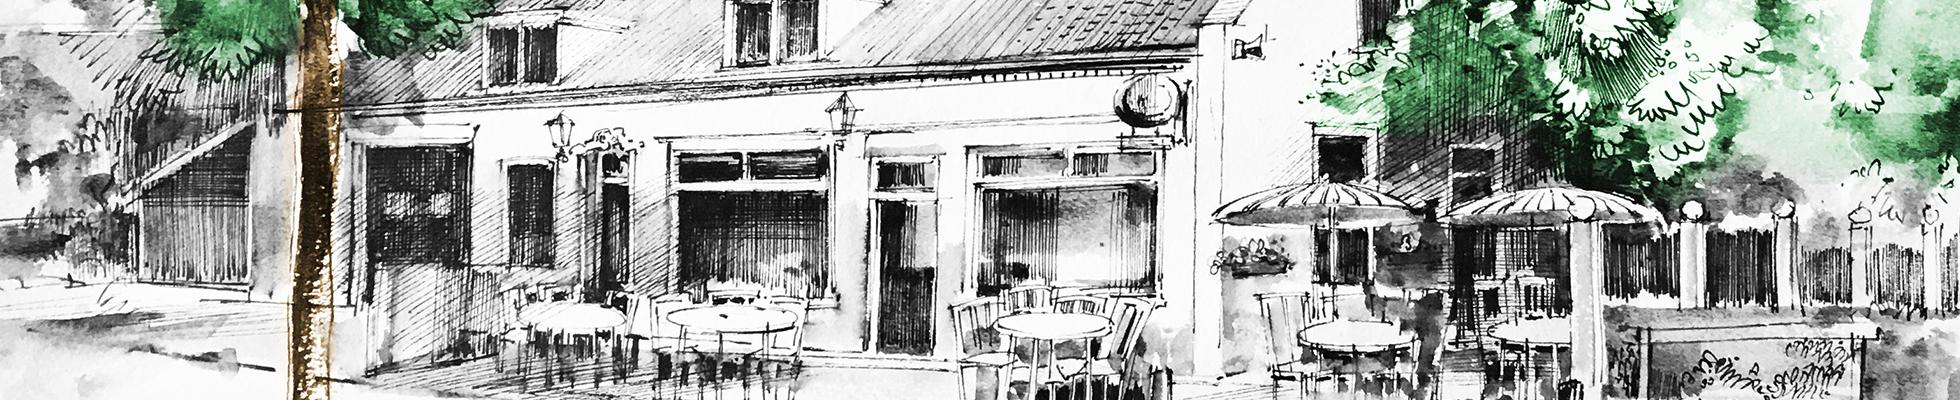 Café Kanters - pentekening Wijnand Thönissen